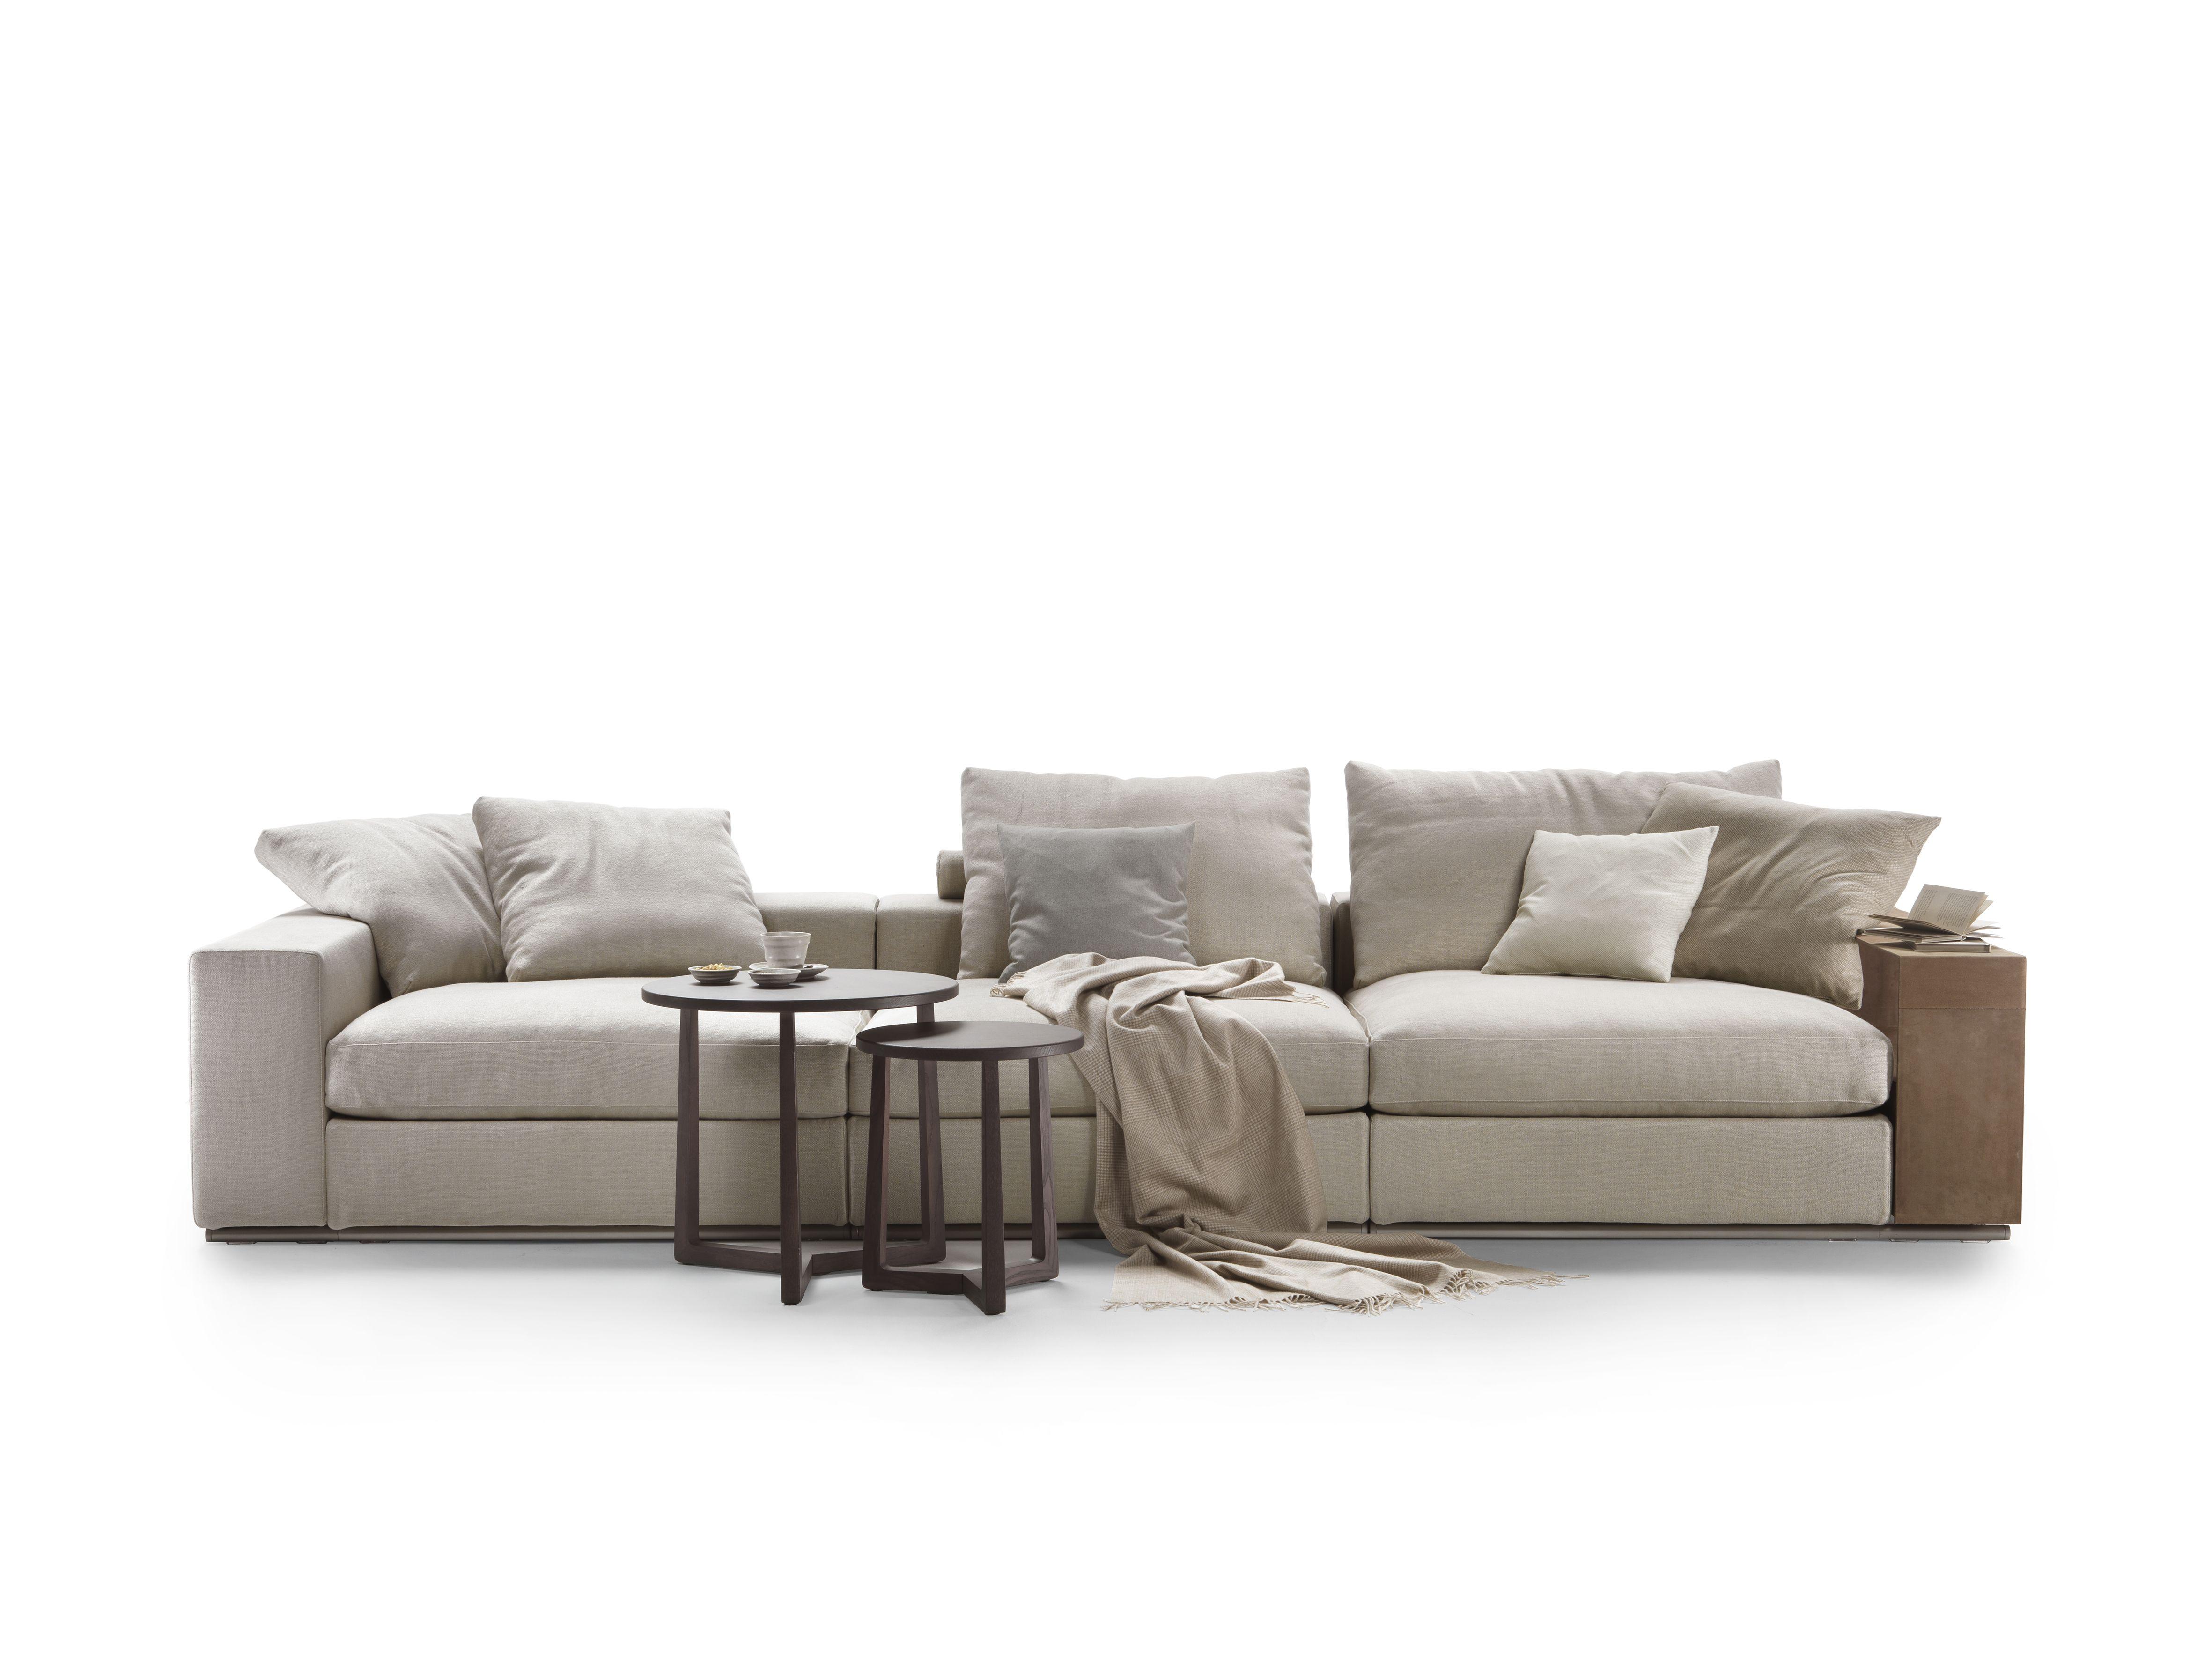 Flexform Groundpiece Bookshelve Flexform Fabric Novalis O  # Muebles Di Giano